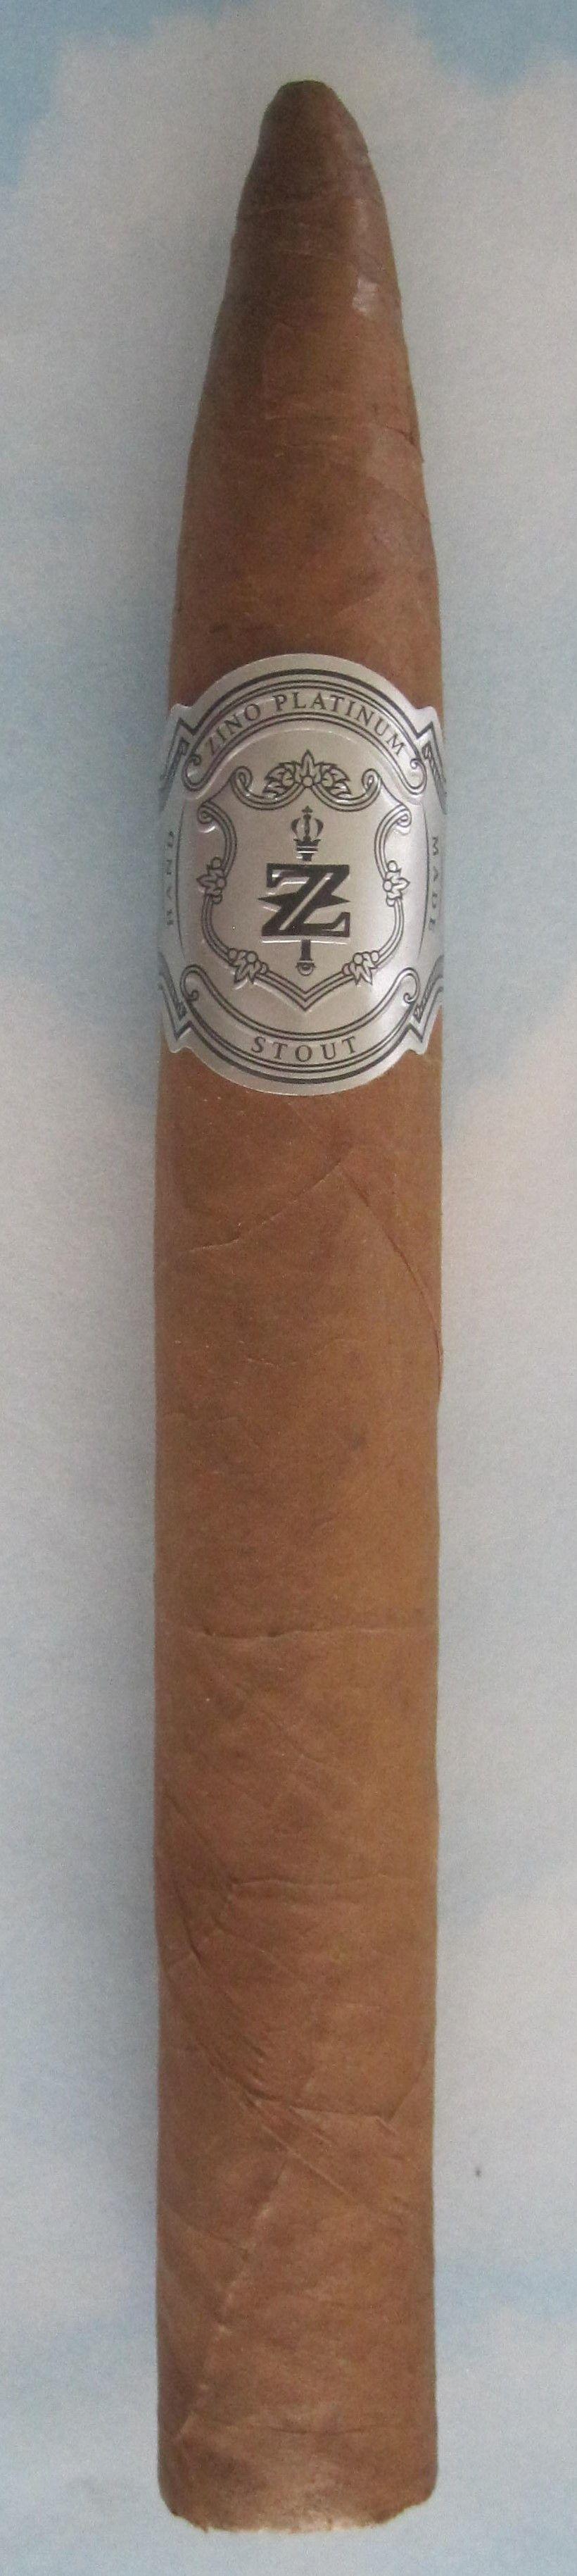 Zino Platinum Stout Cigar